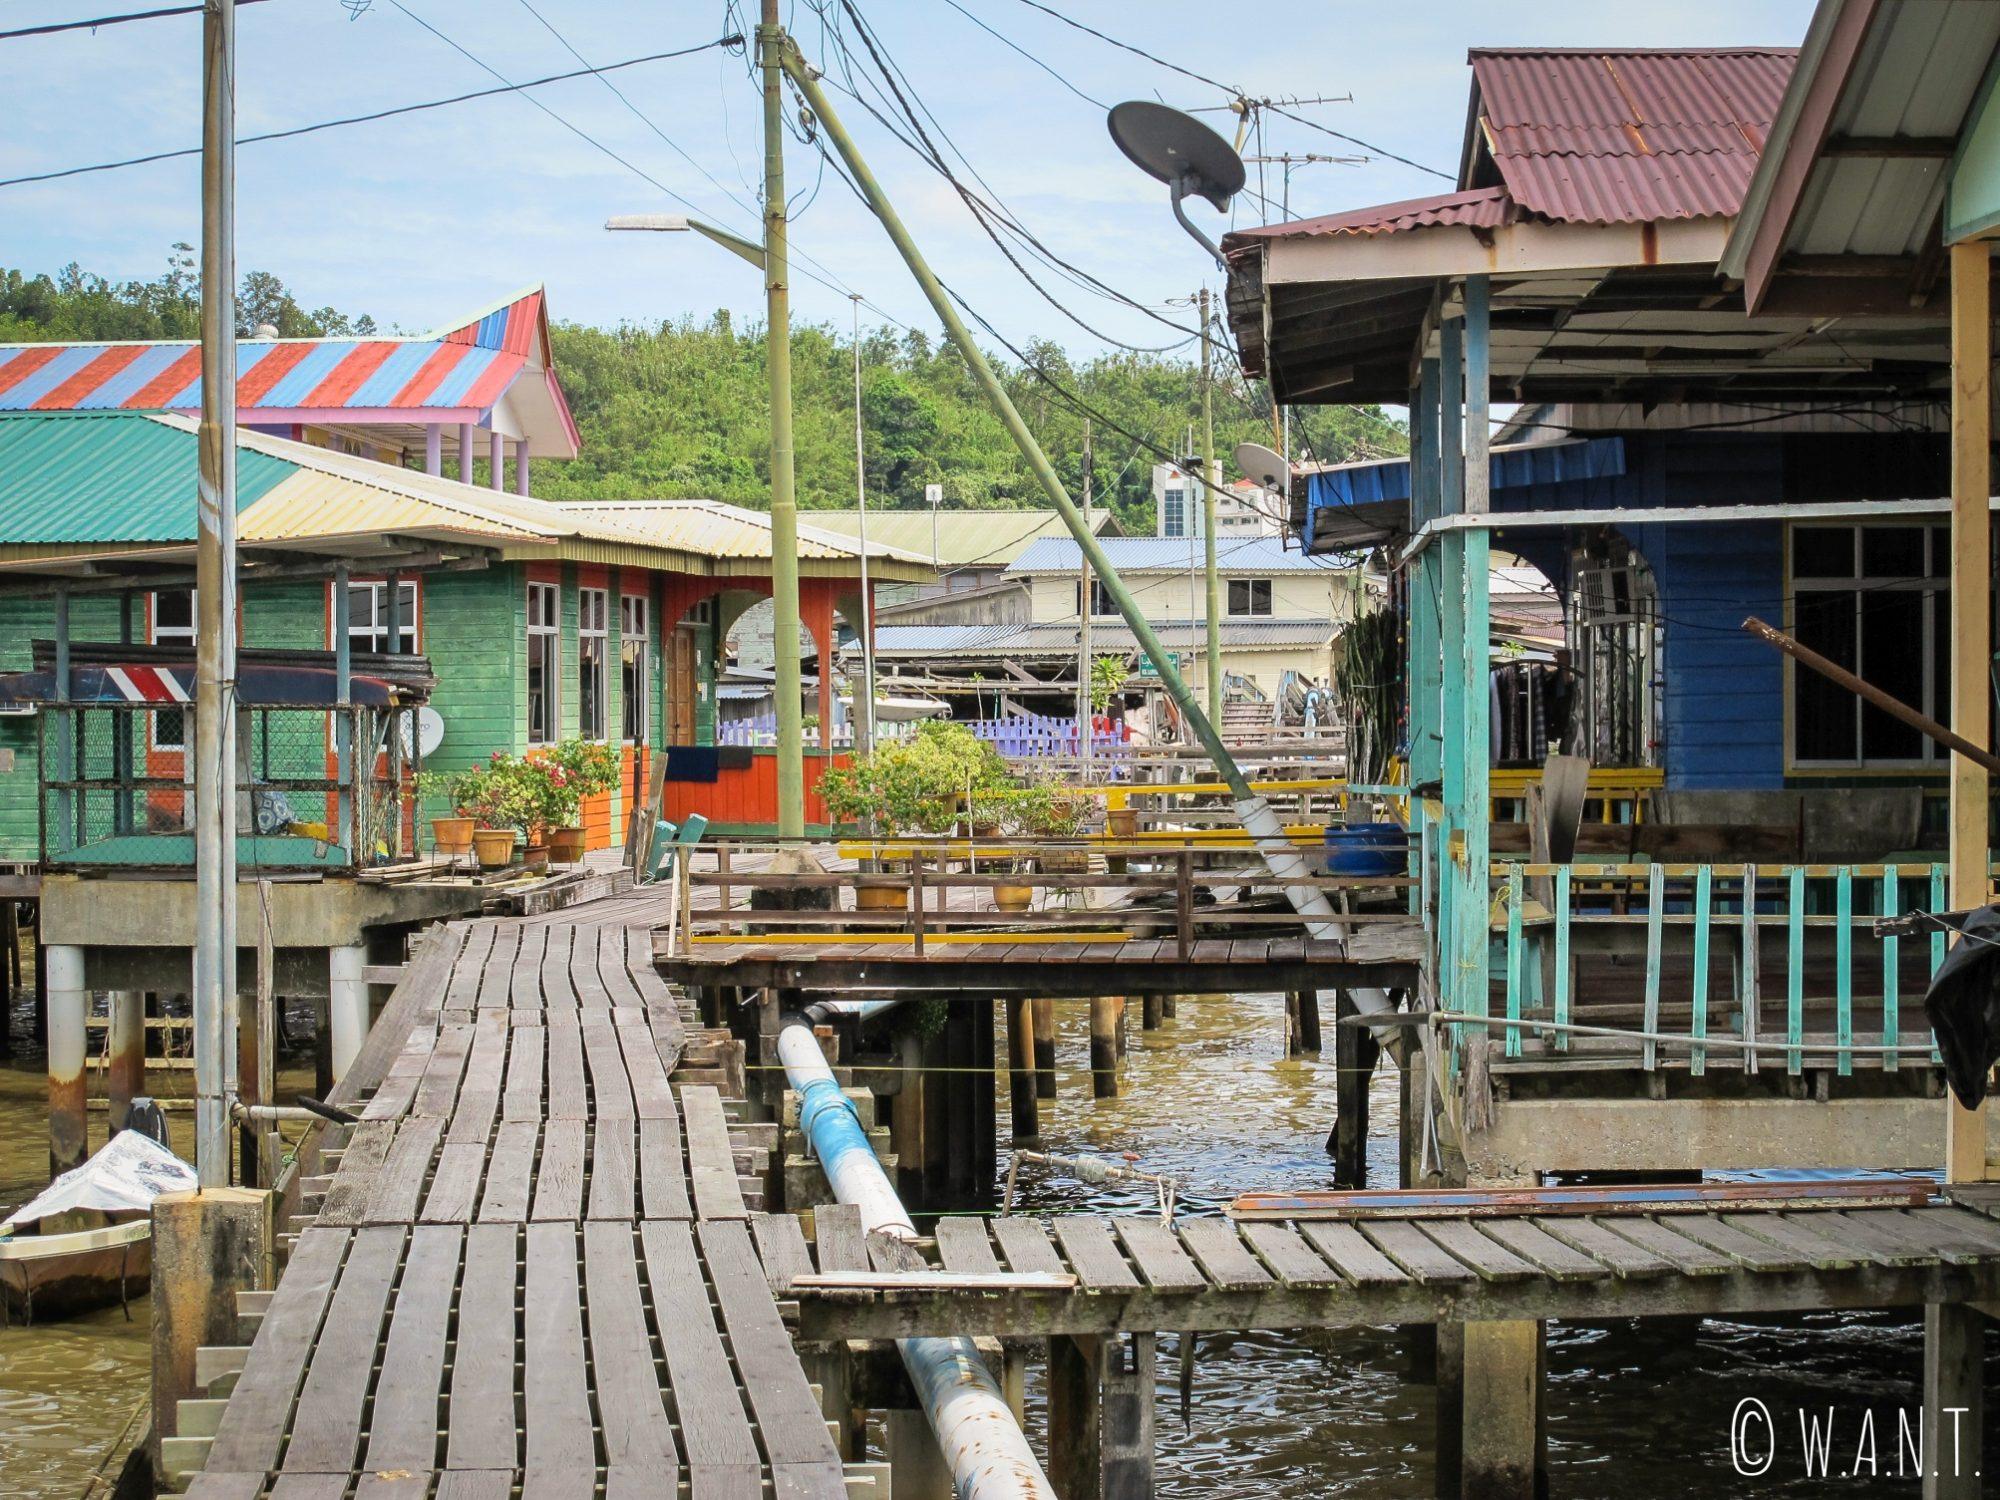 Intérieur du village flottant de Kampong Ayer à Bandar Seri Begawan